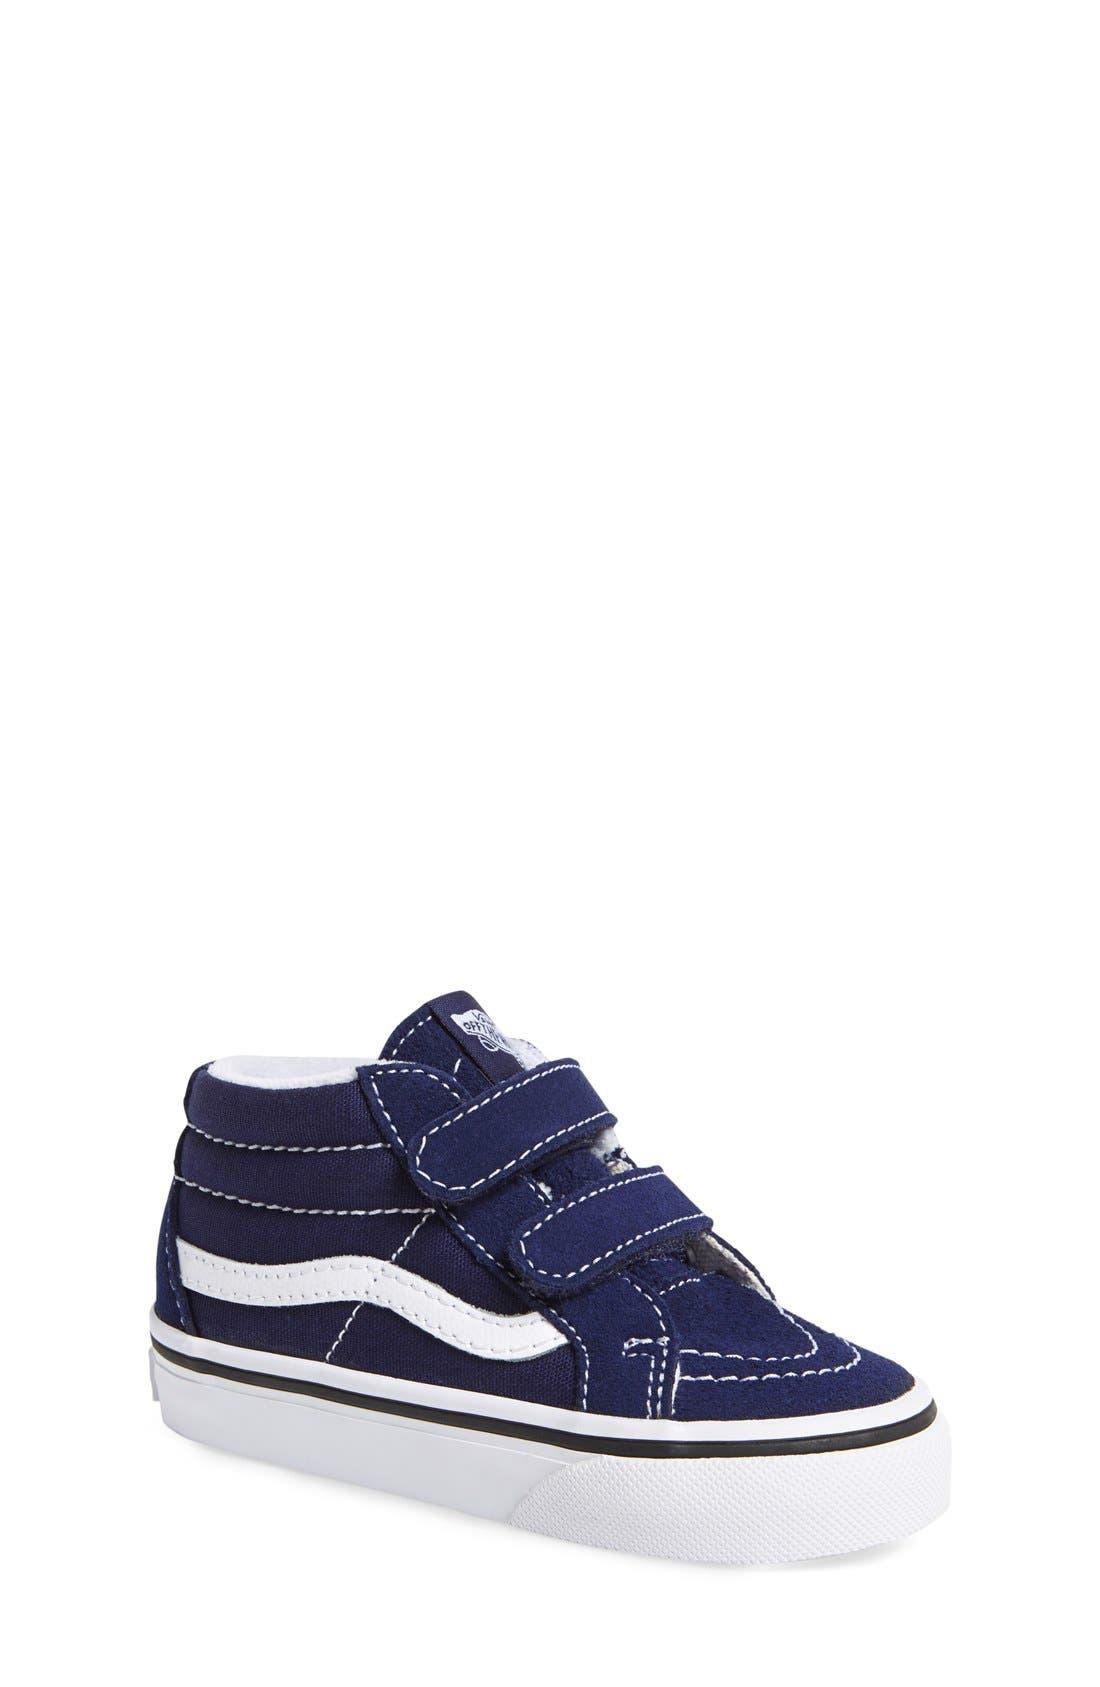 'Sk8-Hi Reissue V' Sneaker,                         Main,                         color, Patriot Blue/ True White